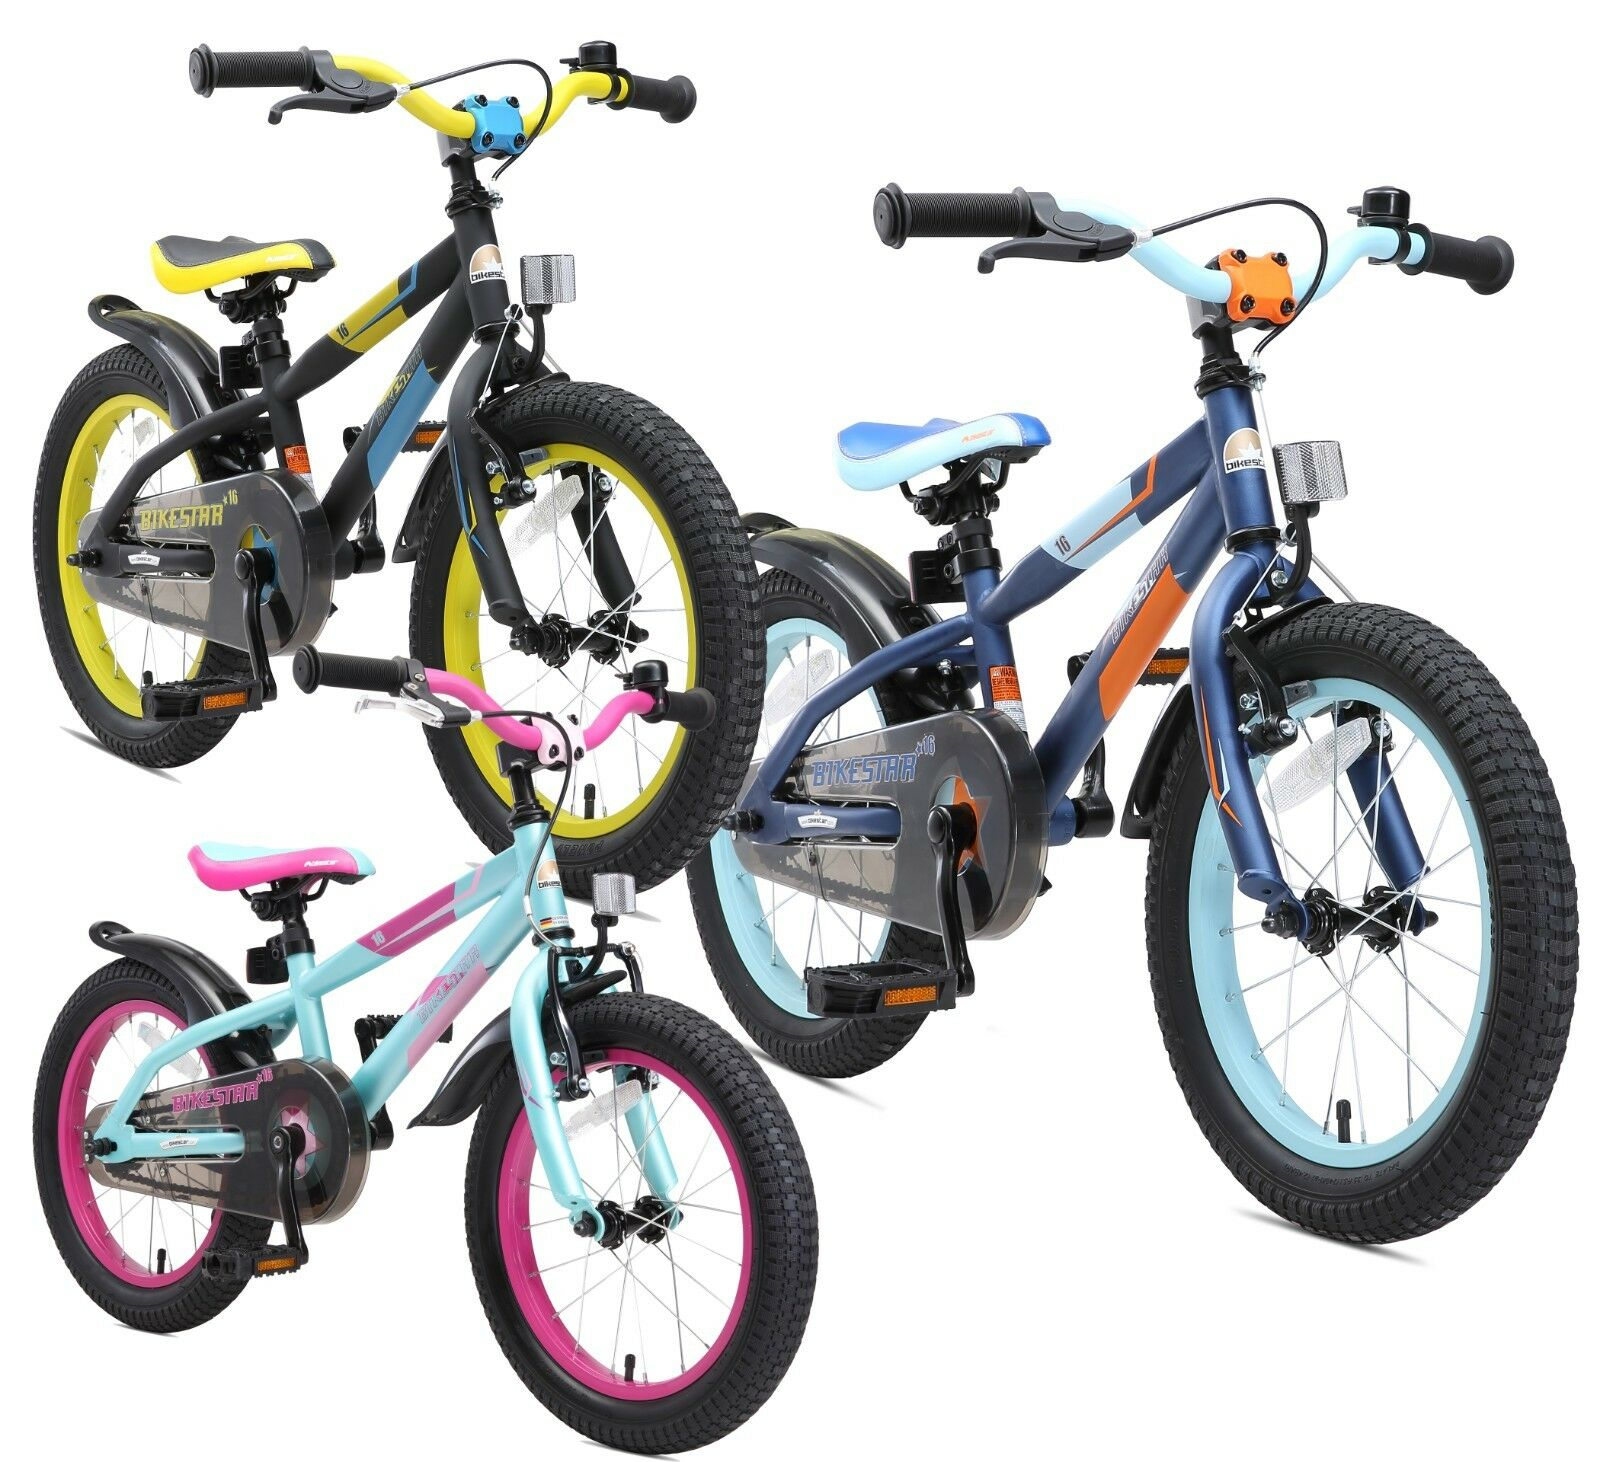 BIKESTAR Kinderfahrrad Kinderrad Fahrrad für Kinder 4 Jahre Mountainbike 16 Zoll